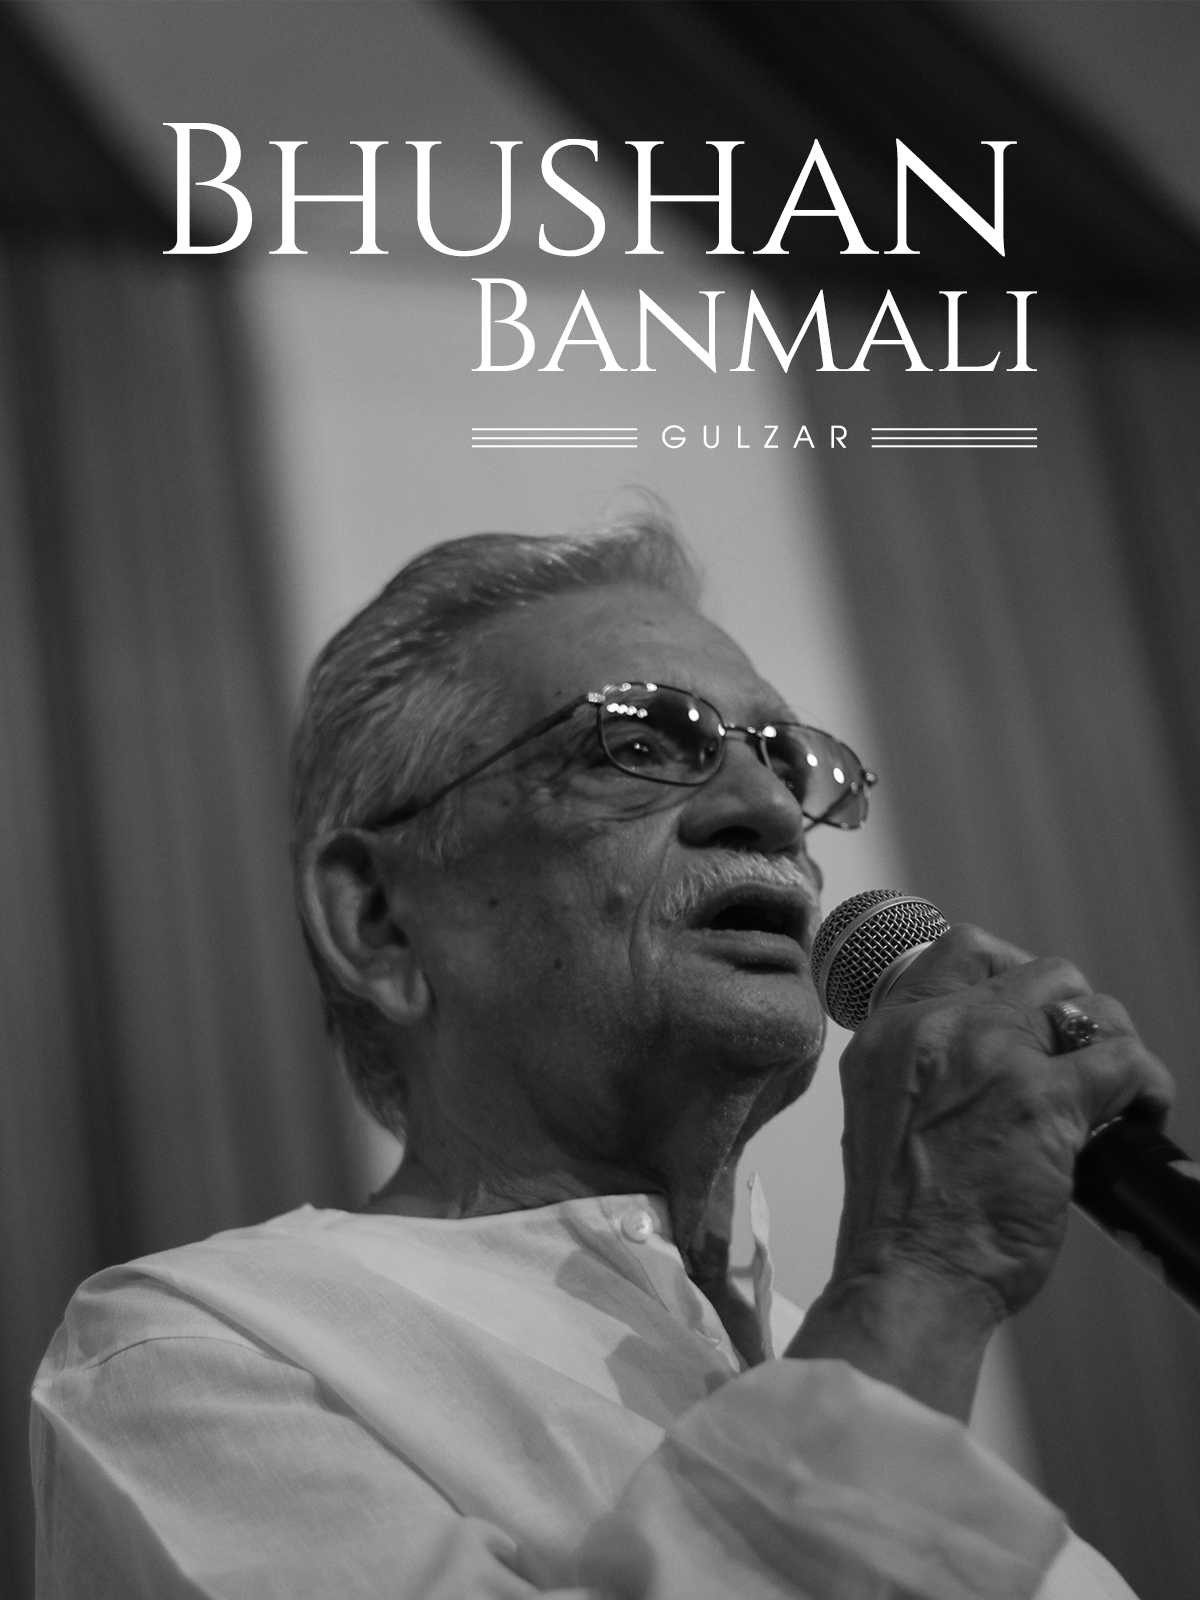 Bhushan Banmali